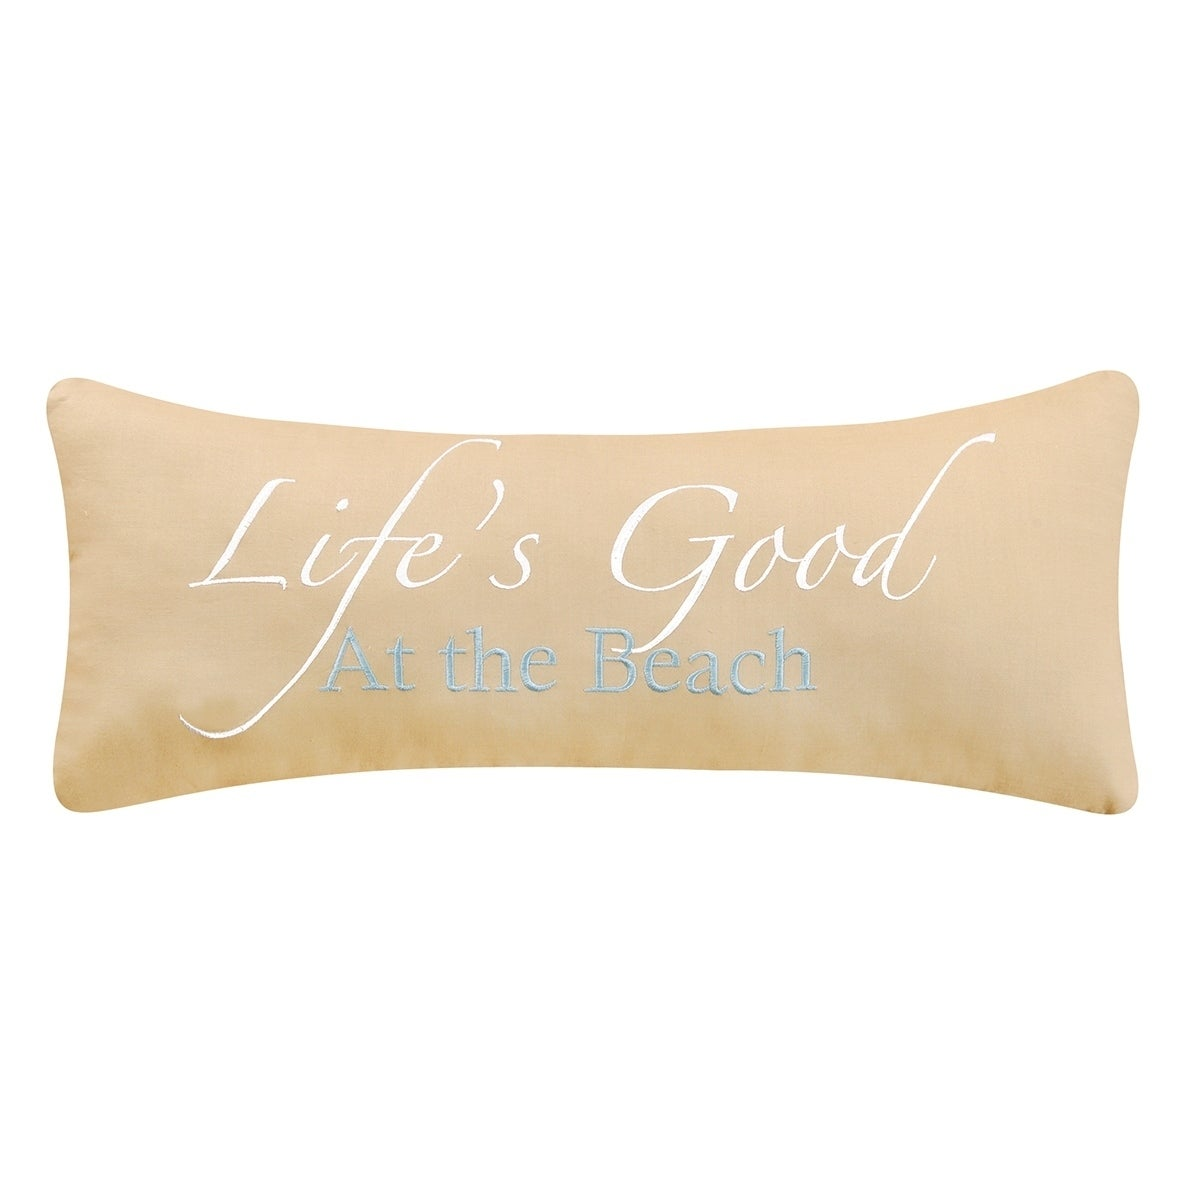 Life's Good At The Beach 8 x 20 Pillow